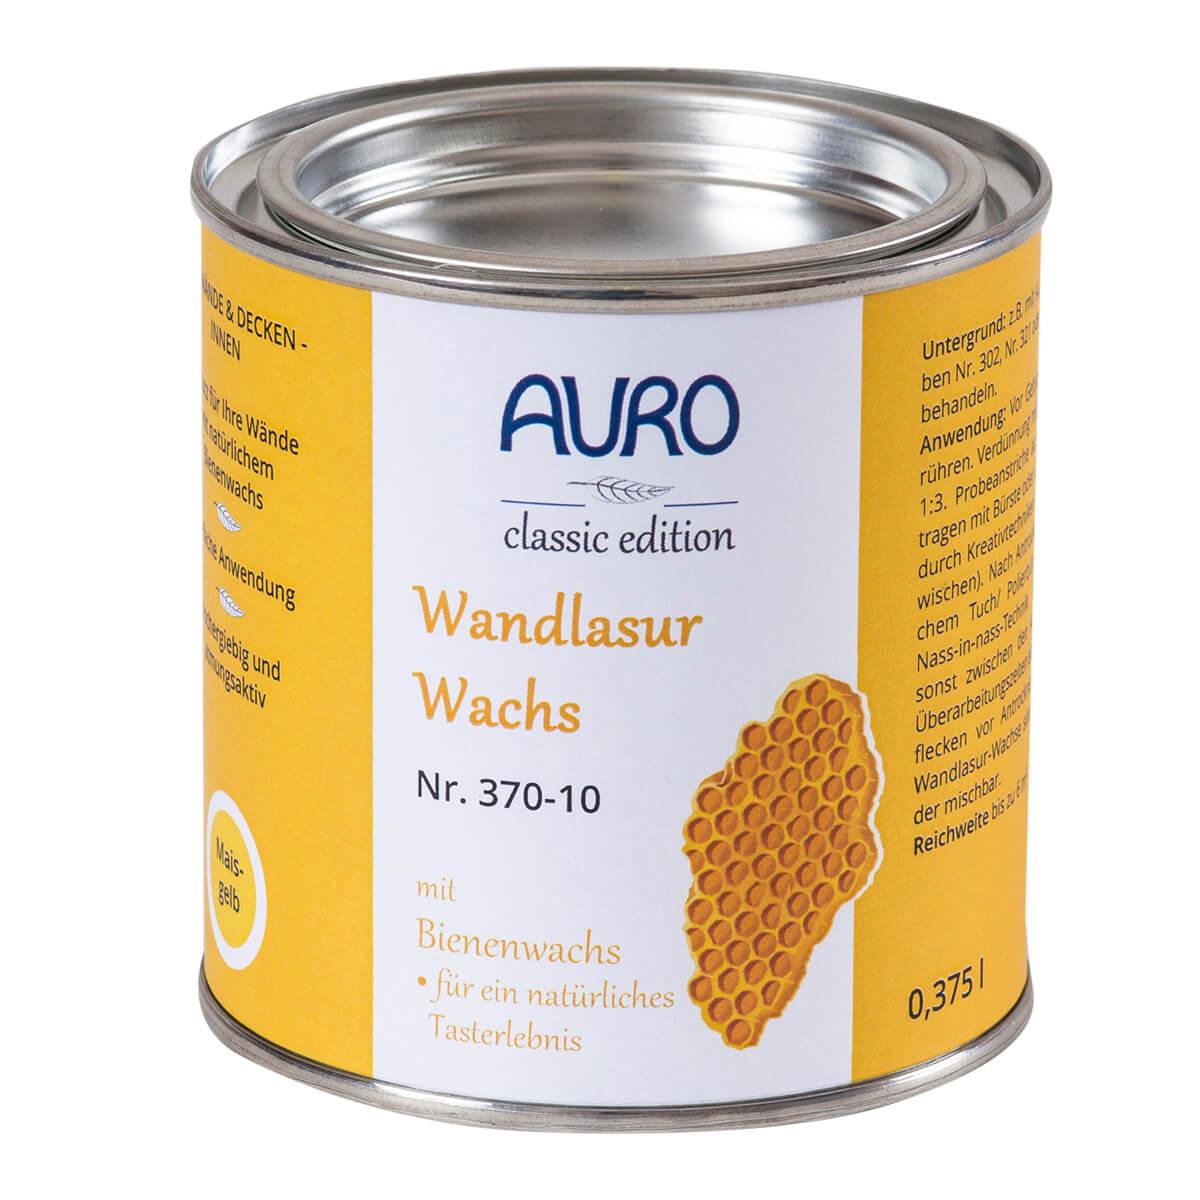 AURO Wandlasur-Wachs Nr. 370 0,375L Pistazie